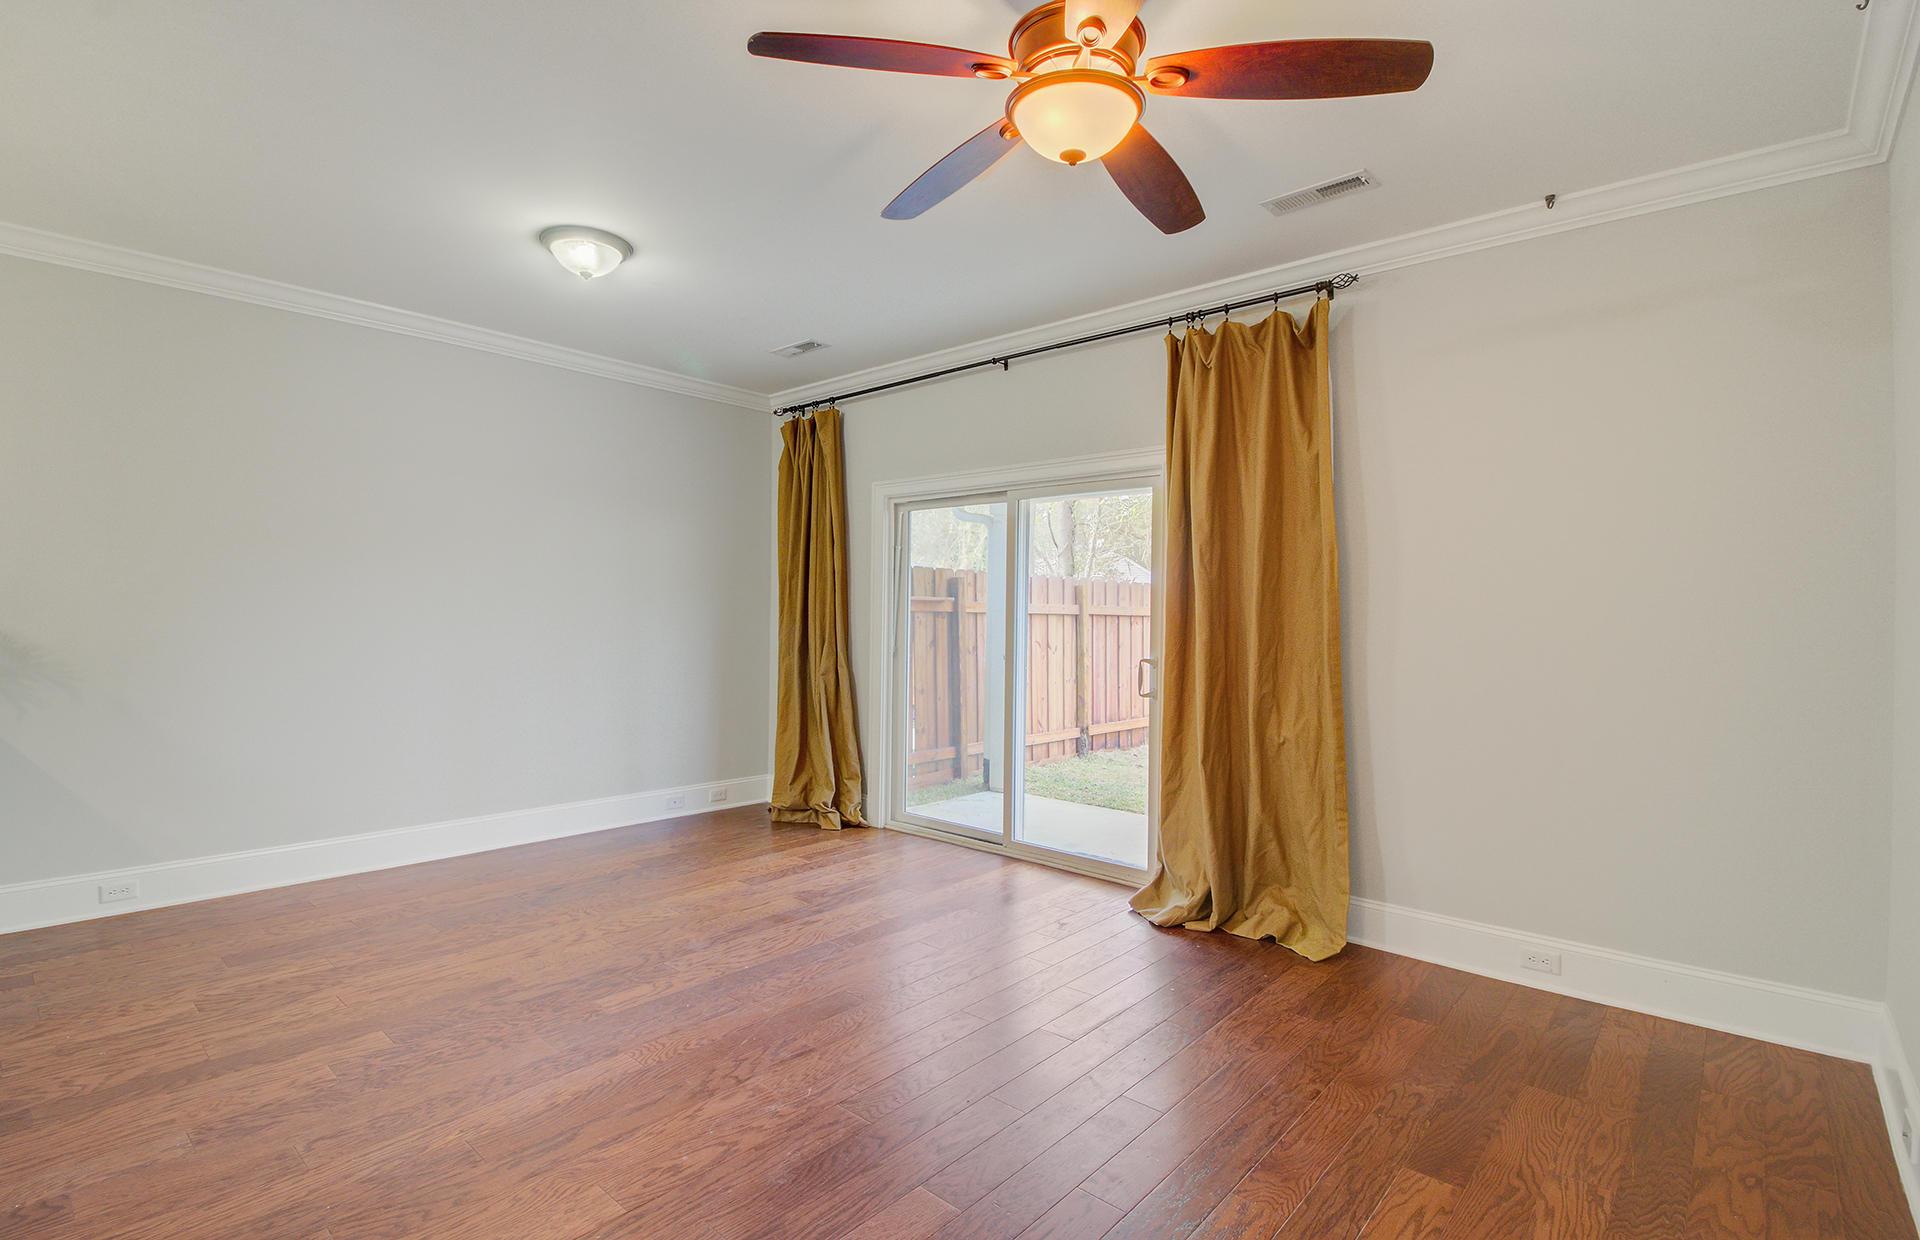 Carol Oaks Town Homes Homes For Sale - 2960 Emma, Mount Pleasant, SC - 9